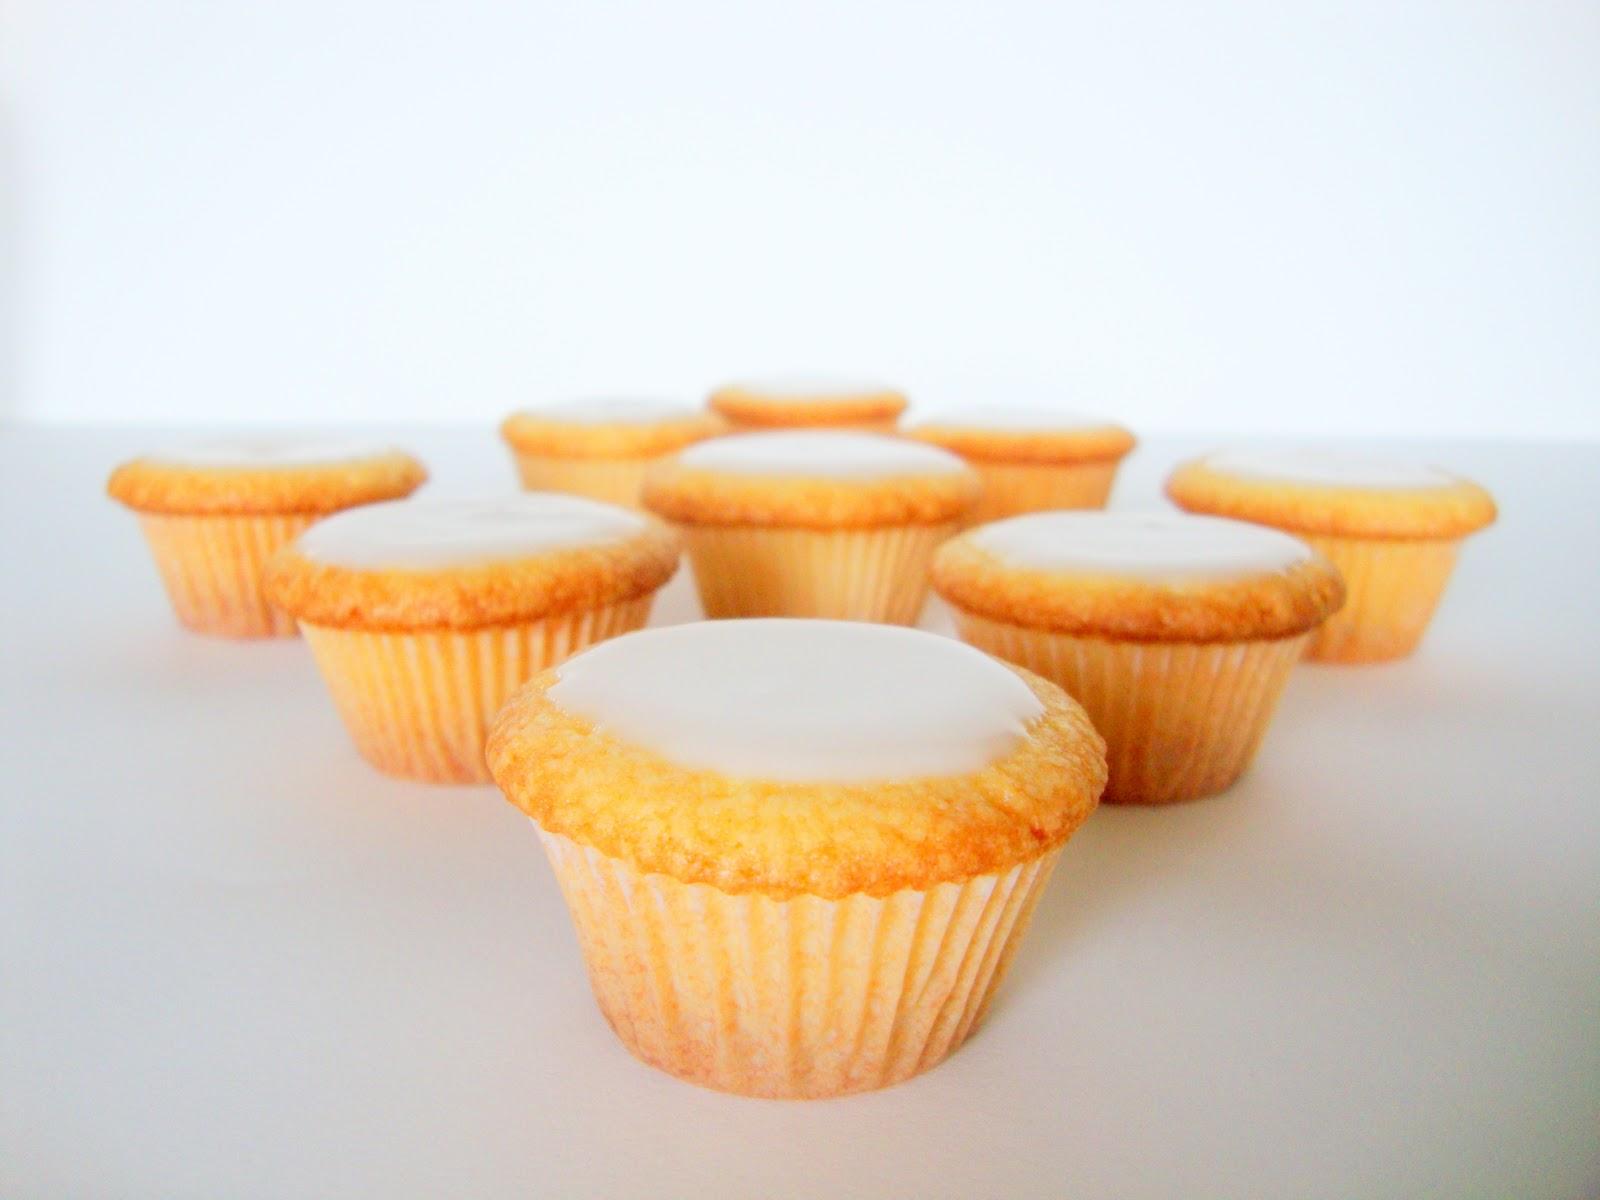 7 up cupcakes